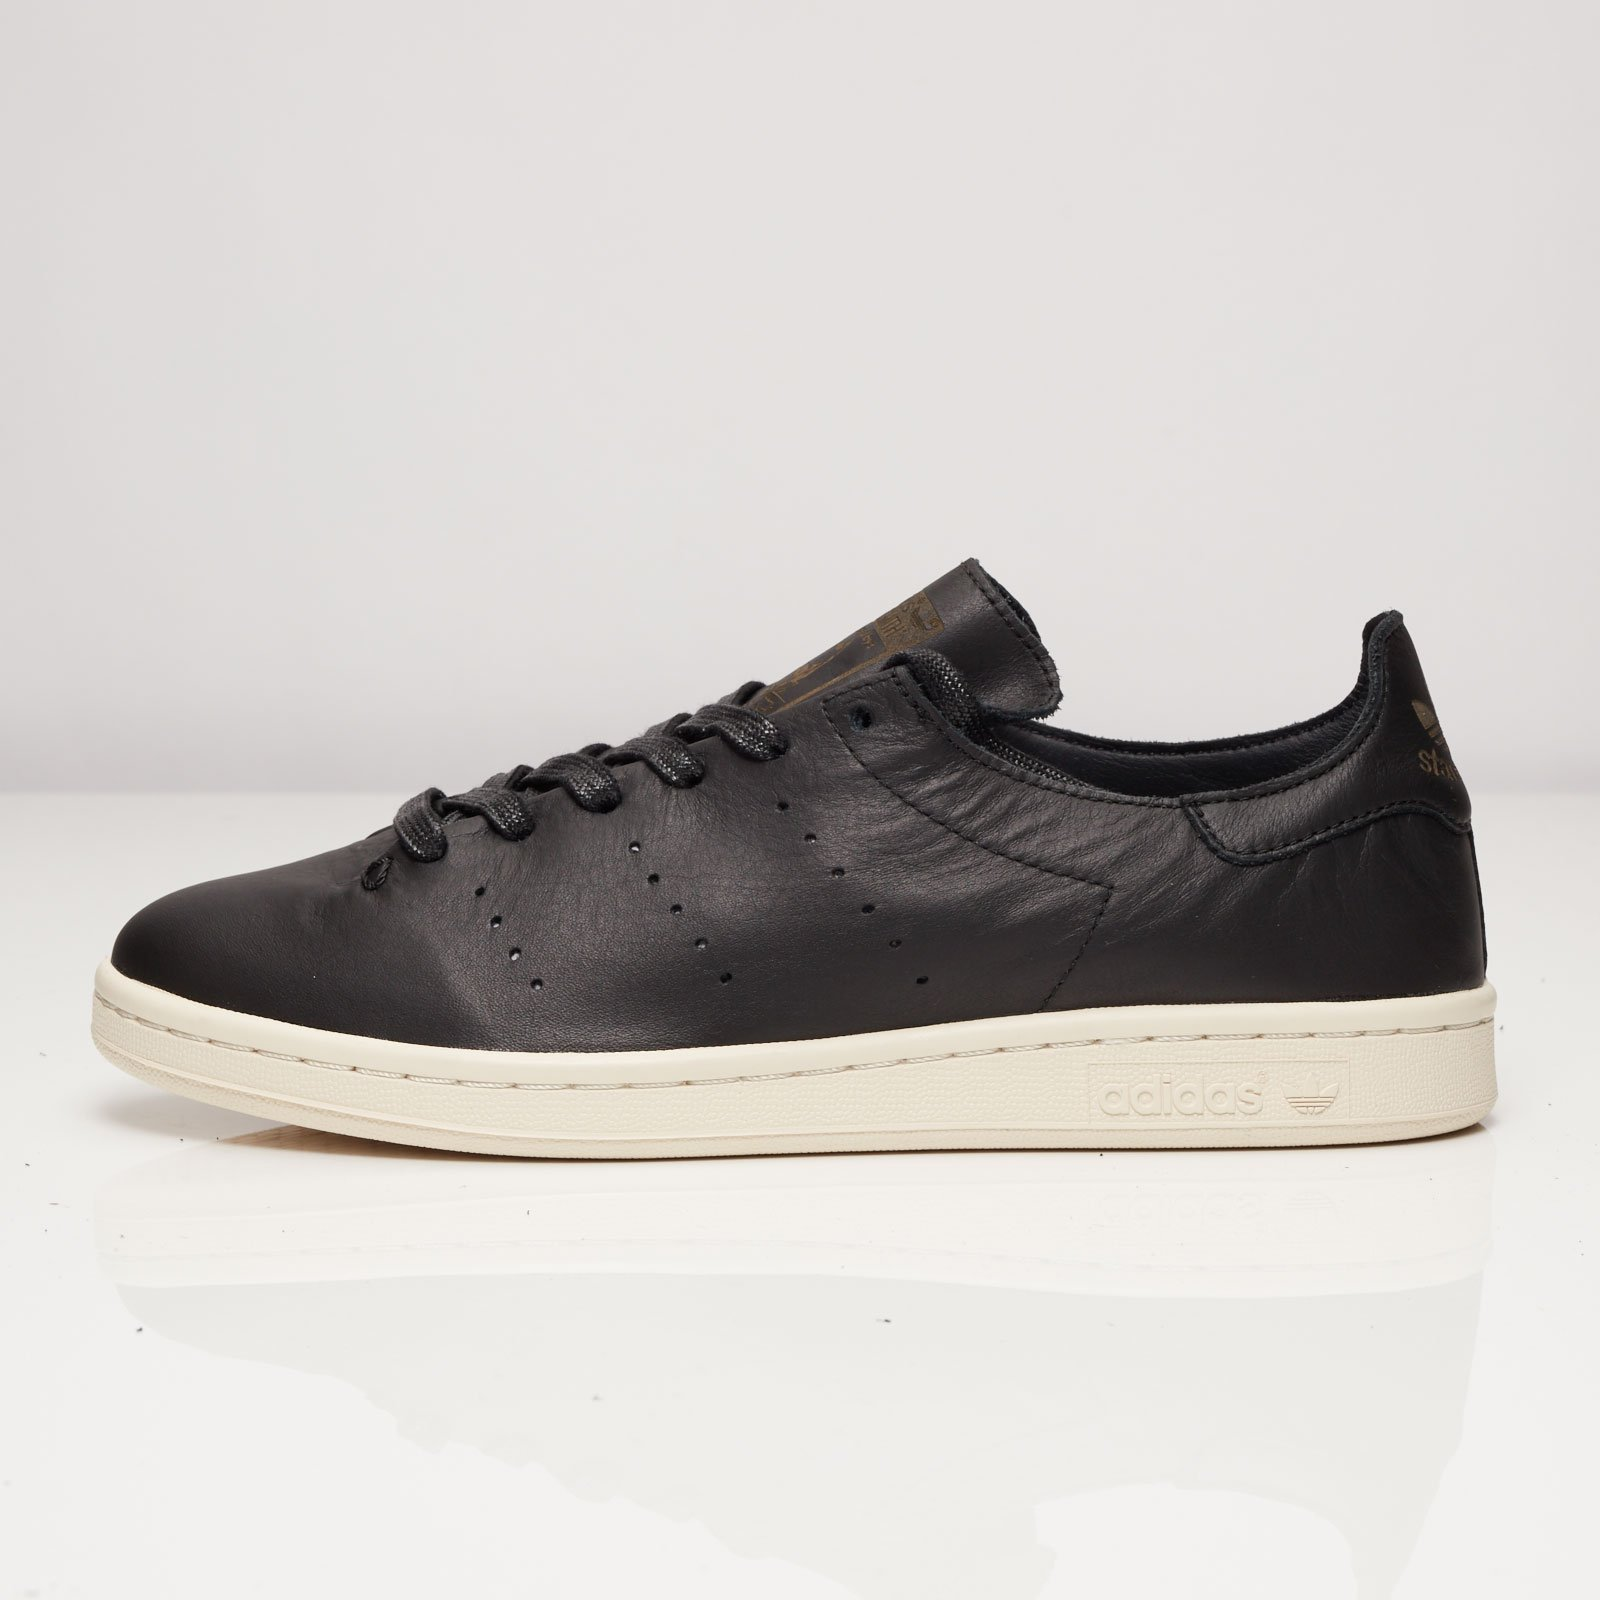 9ed076314 adidas Stan Smith Leather - Aq4788 - Sneakersnstuff